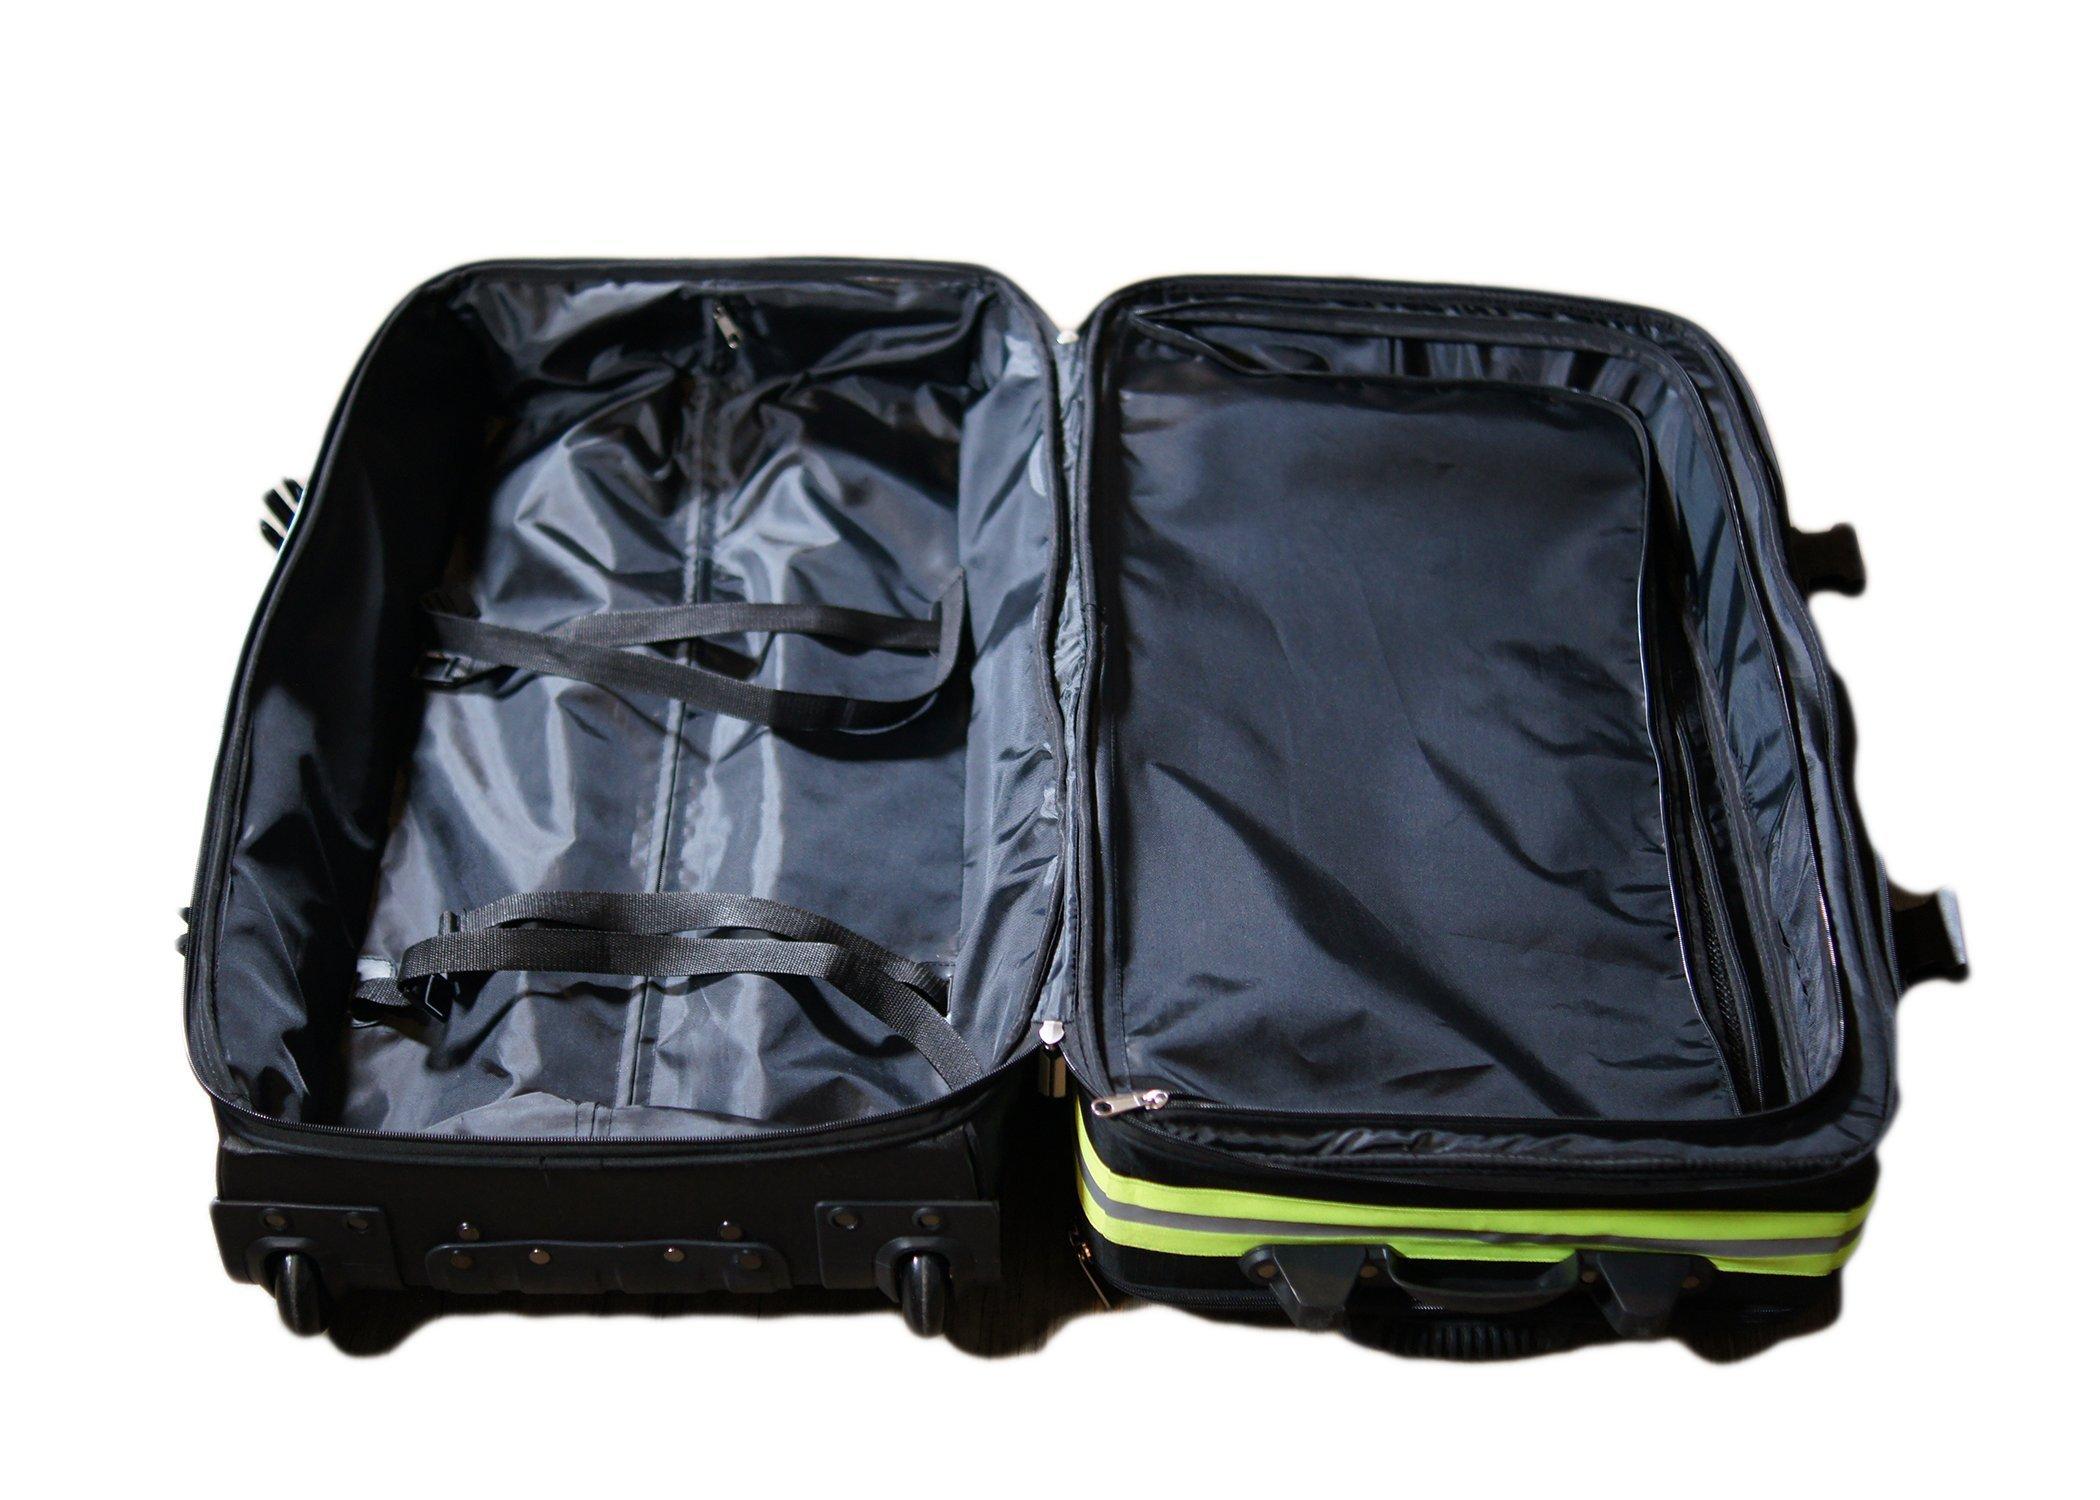 Fireflex Firefighter Rolling Travel Bag (Black) by Firefighters Merchandise (Image #6)